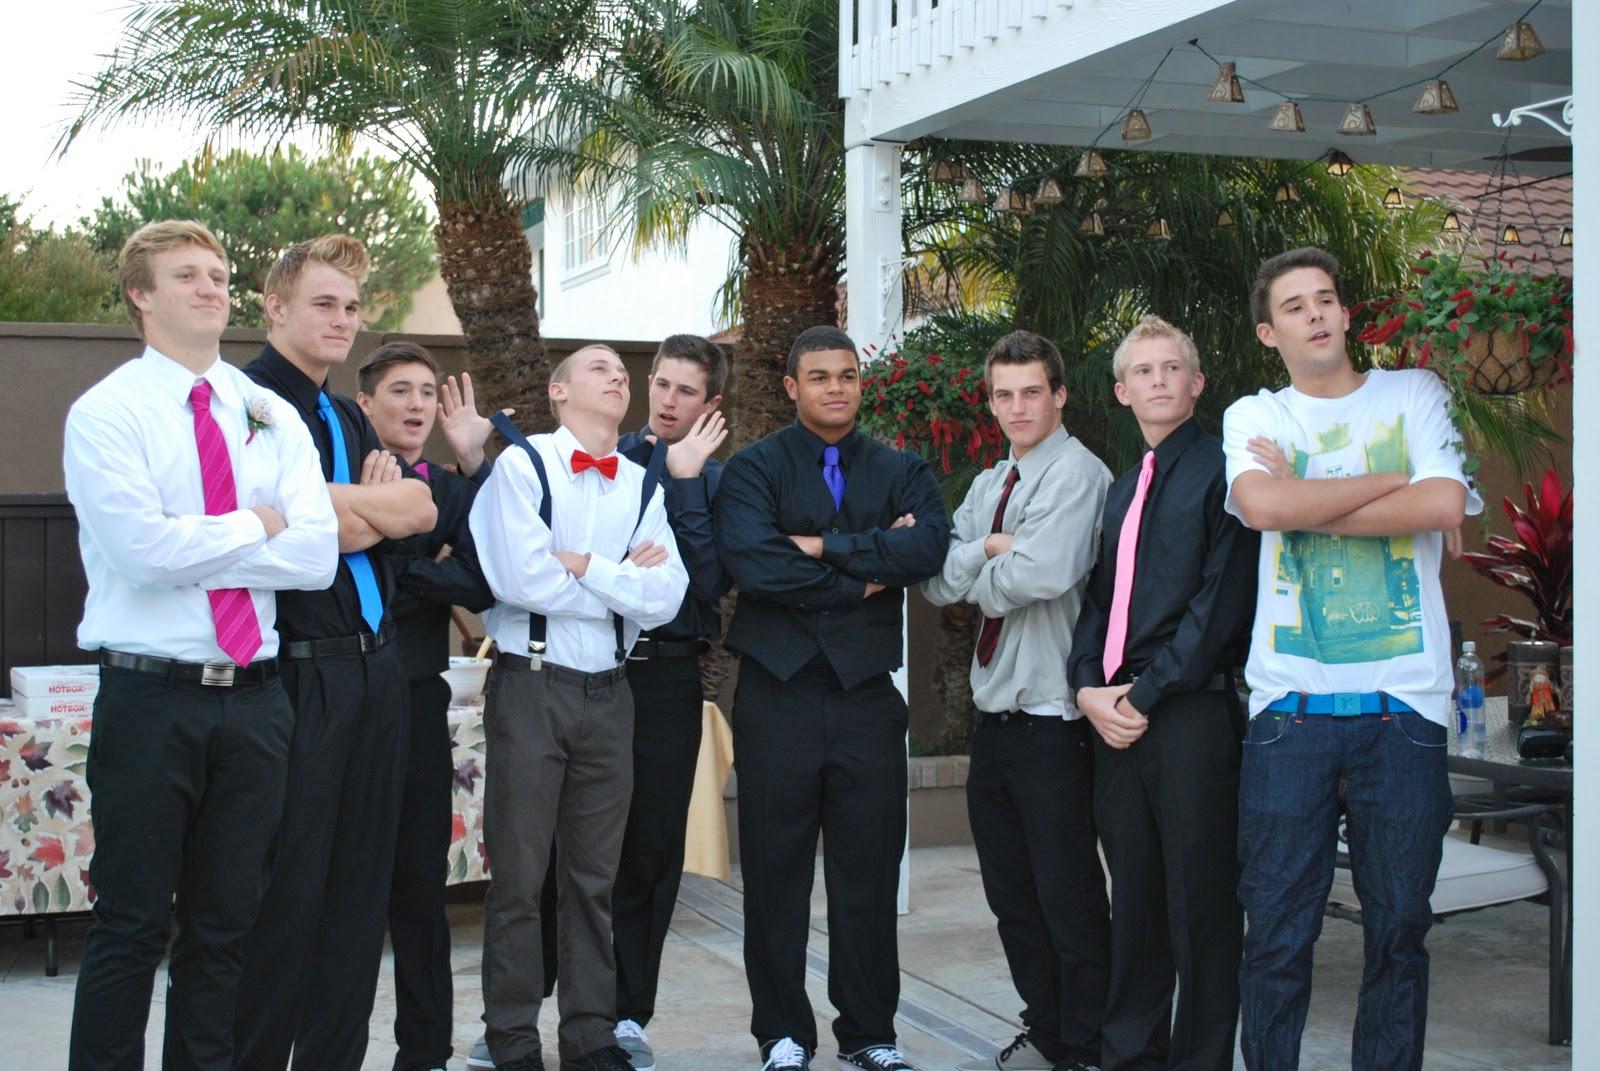 Boys Homecoming Dress